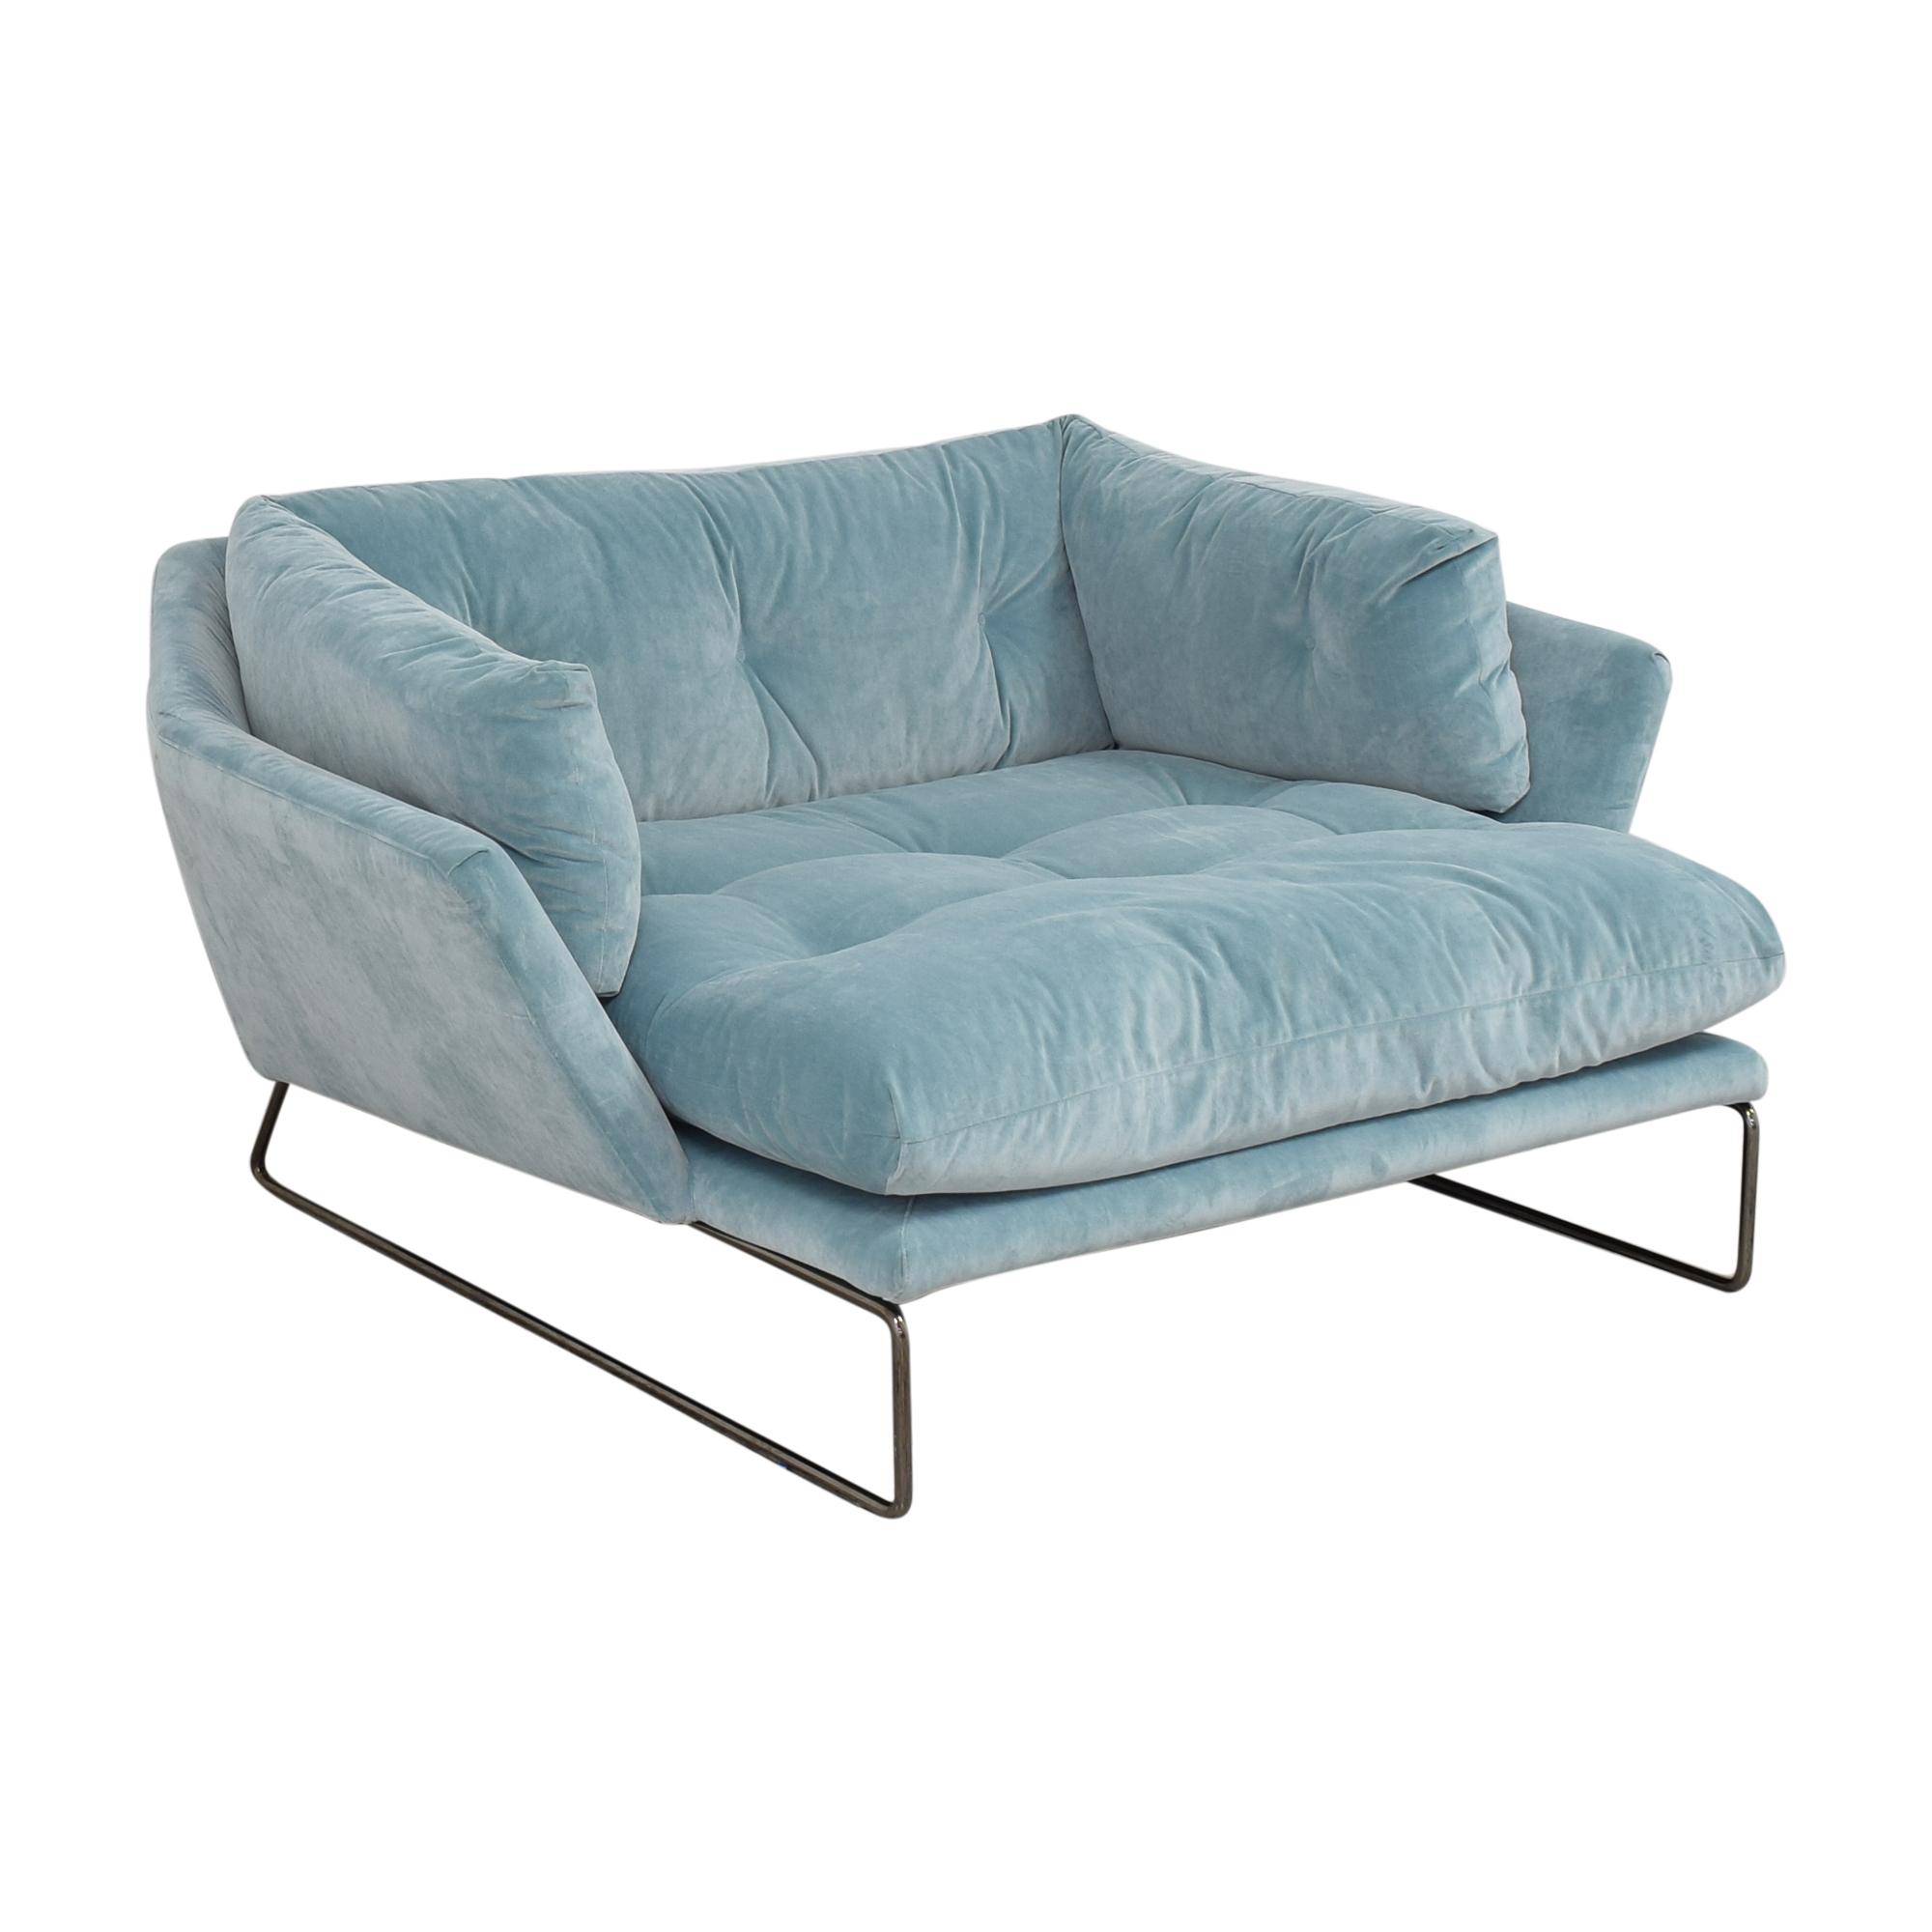 ABC Carpet & Home New York Suite Double Chair sale